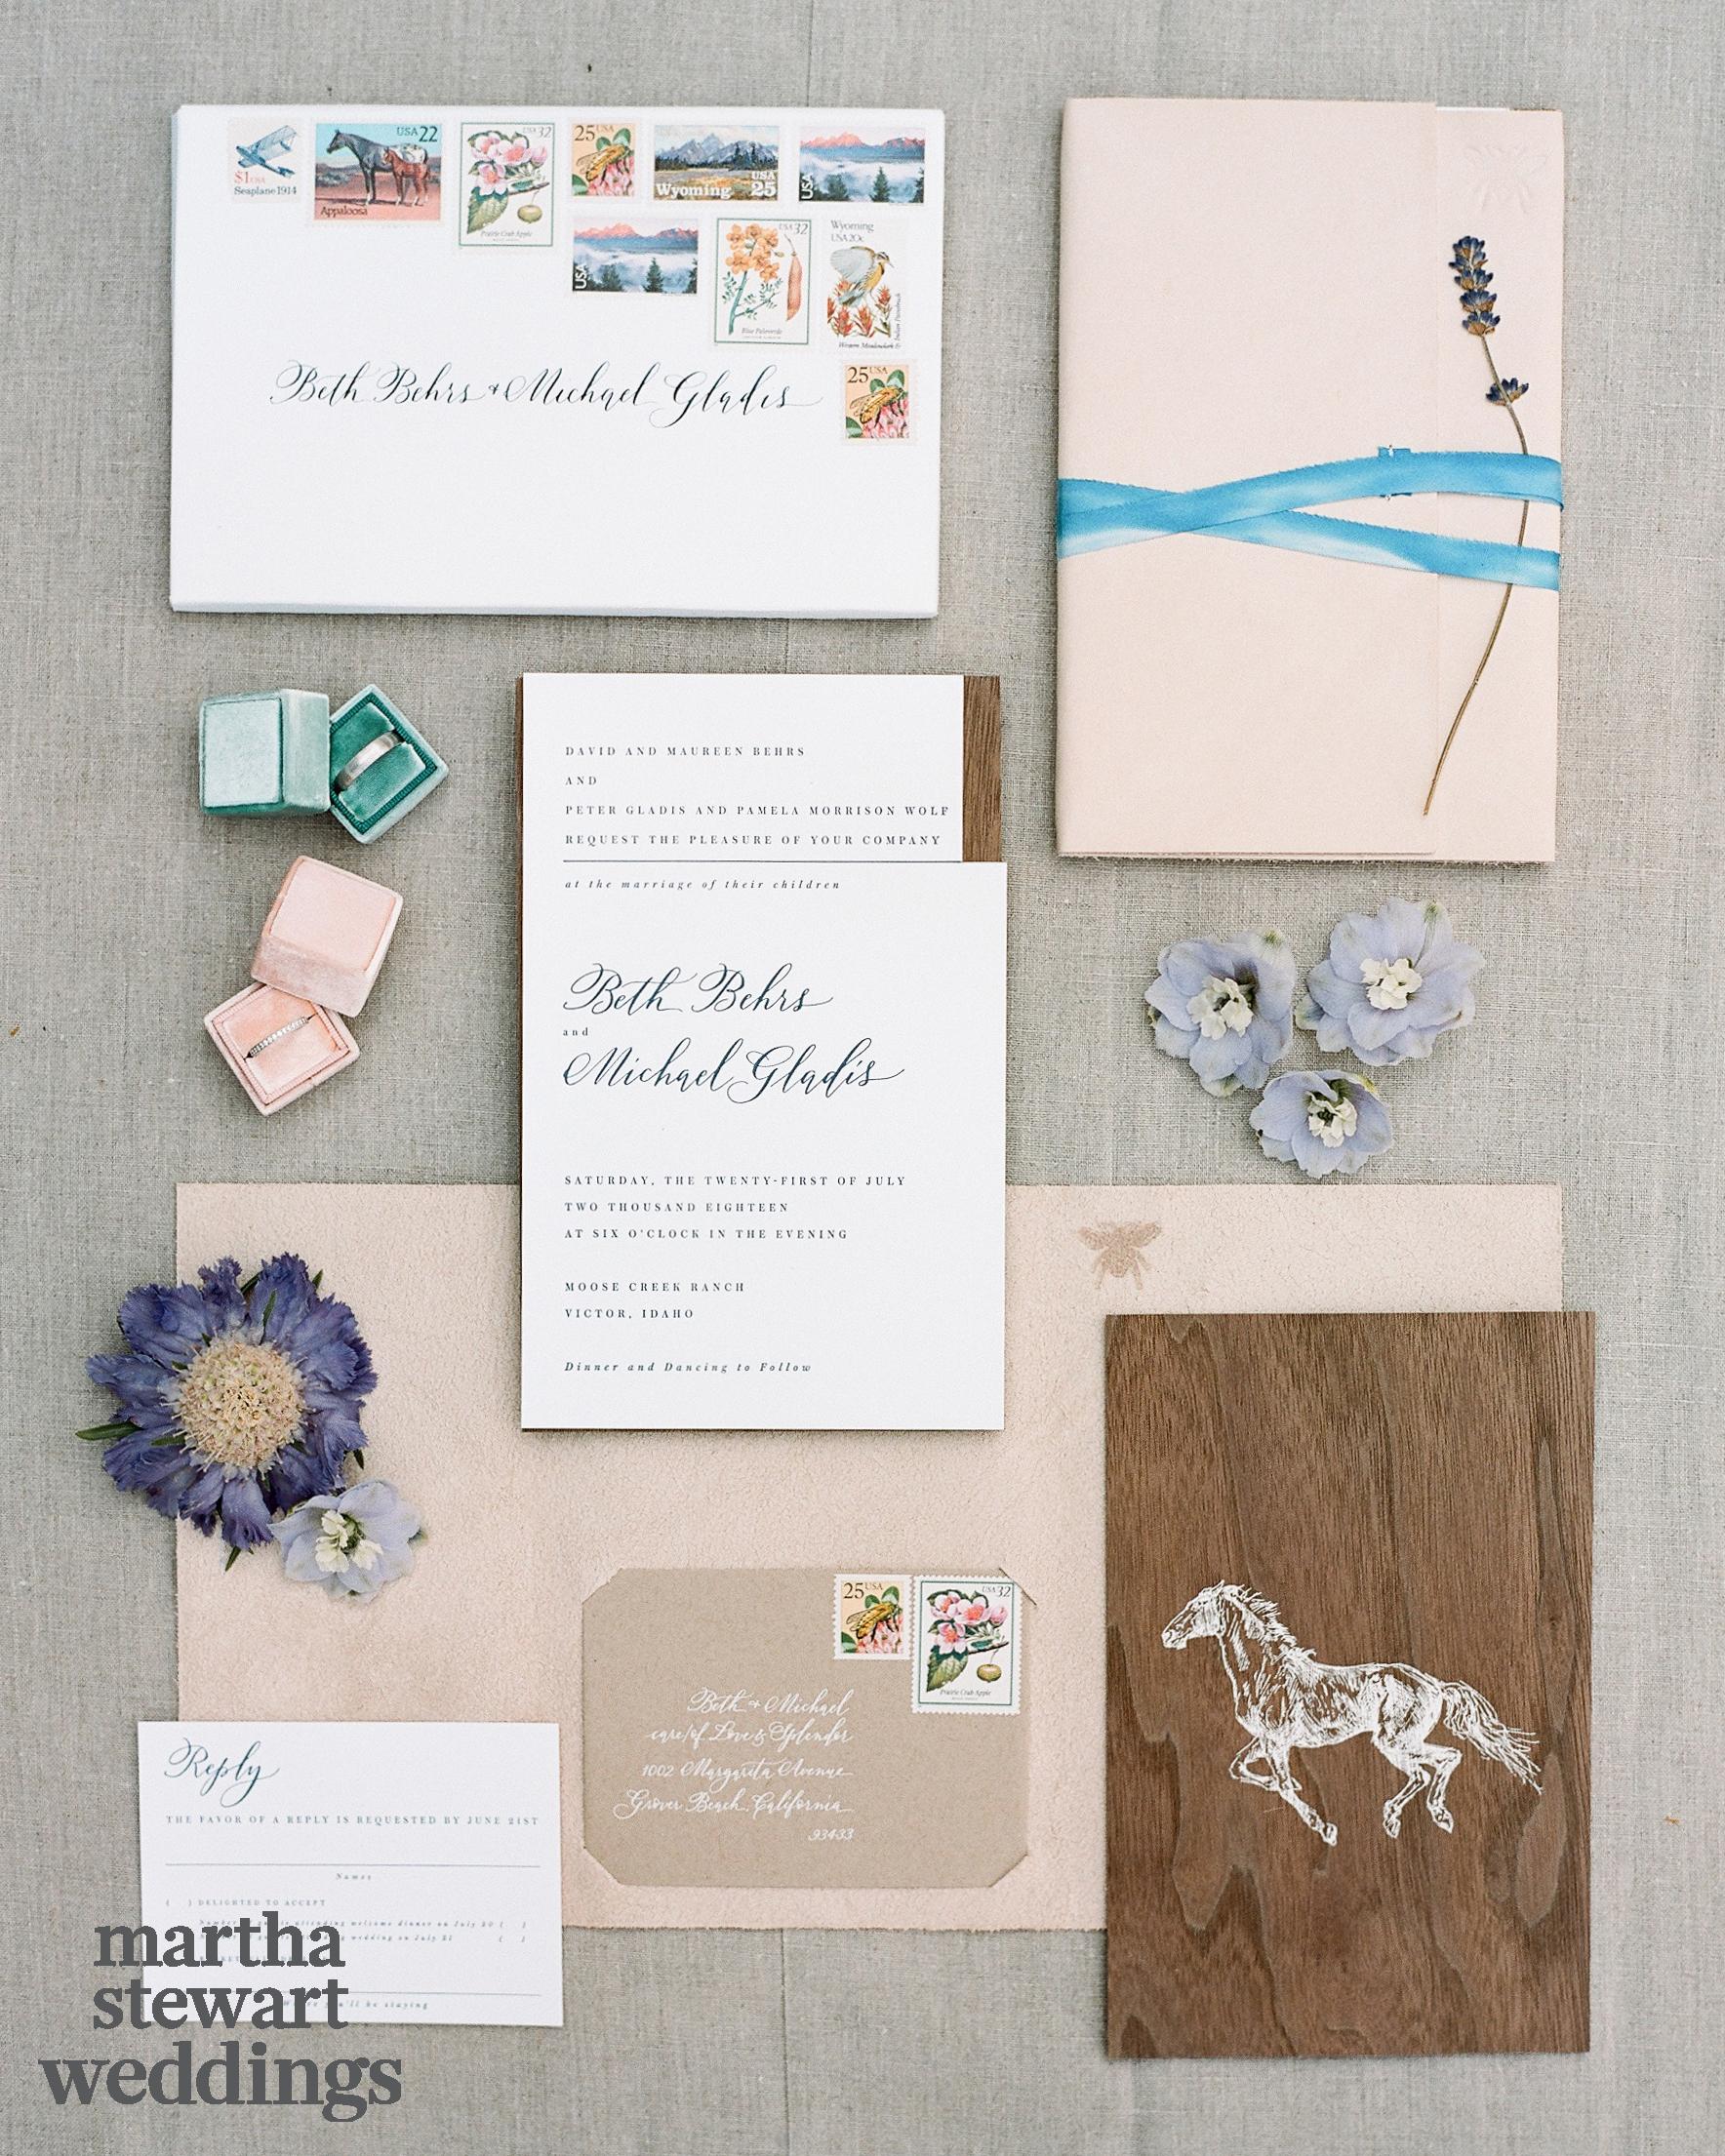 beth behrs michael gladis wedding invitation sylvie gil